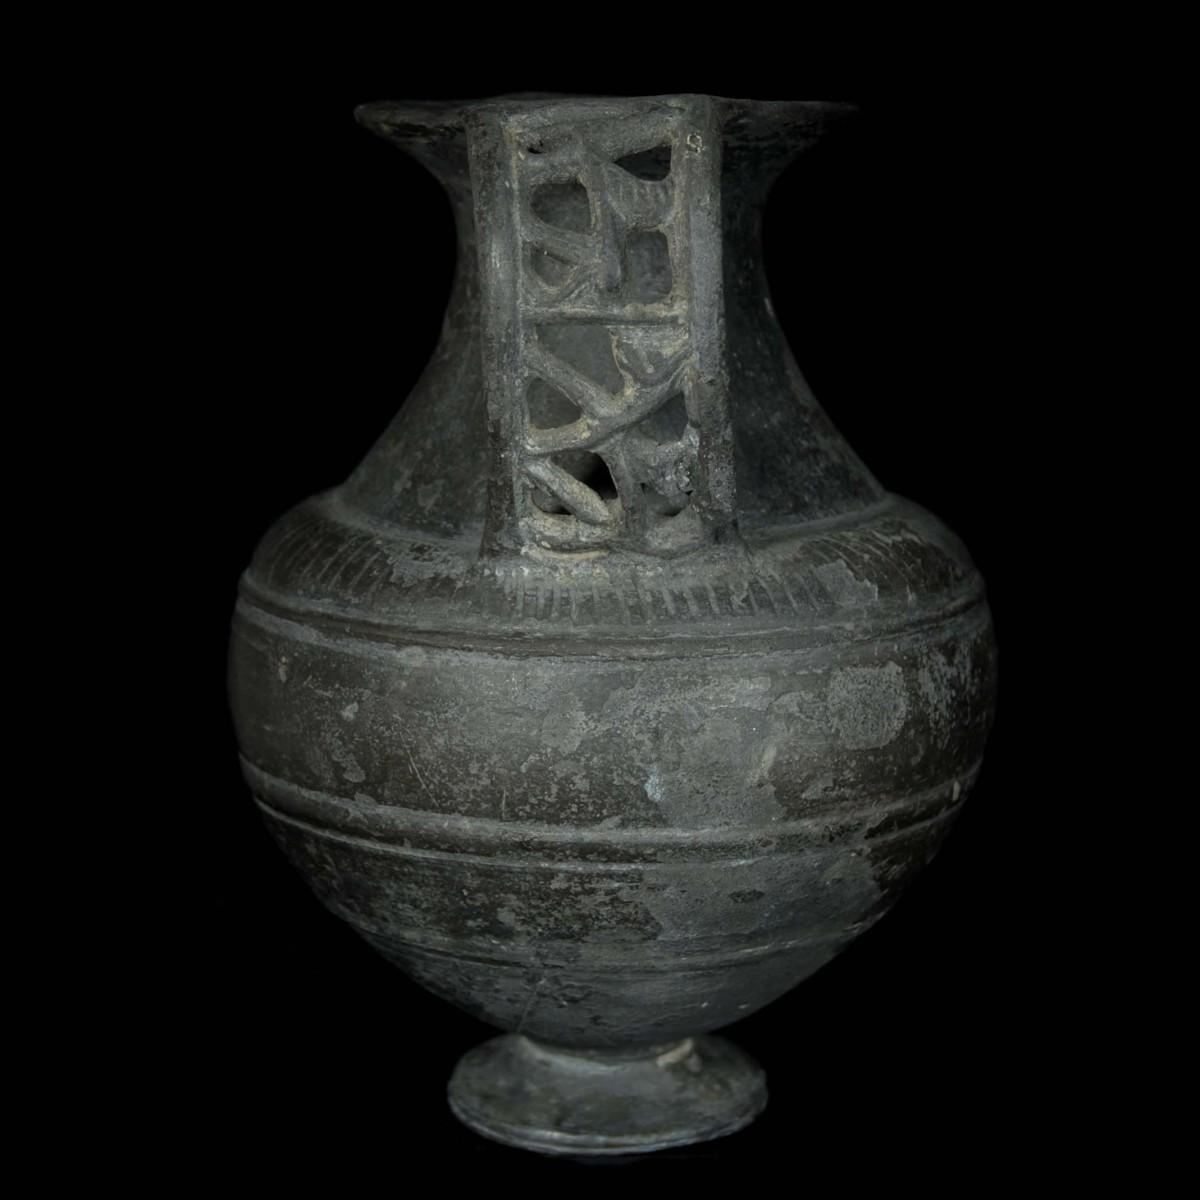 Etruscan Bucchero Ware amphora side